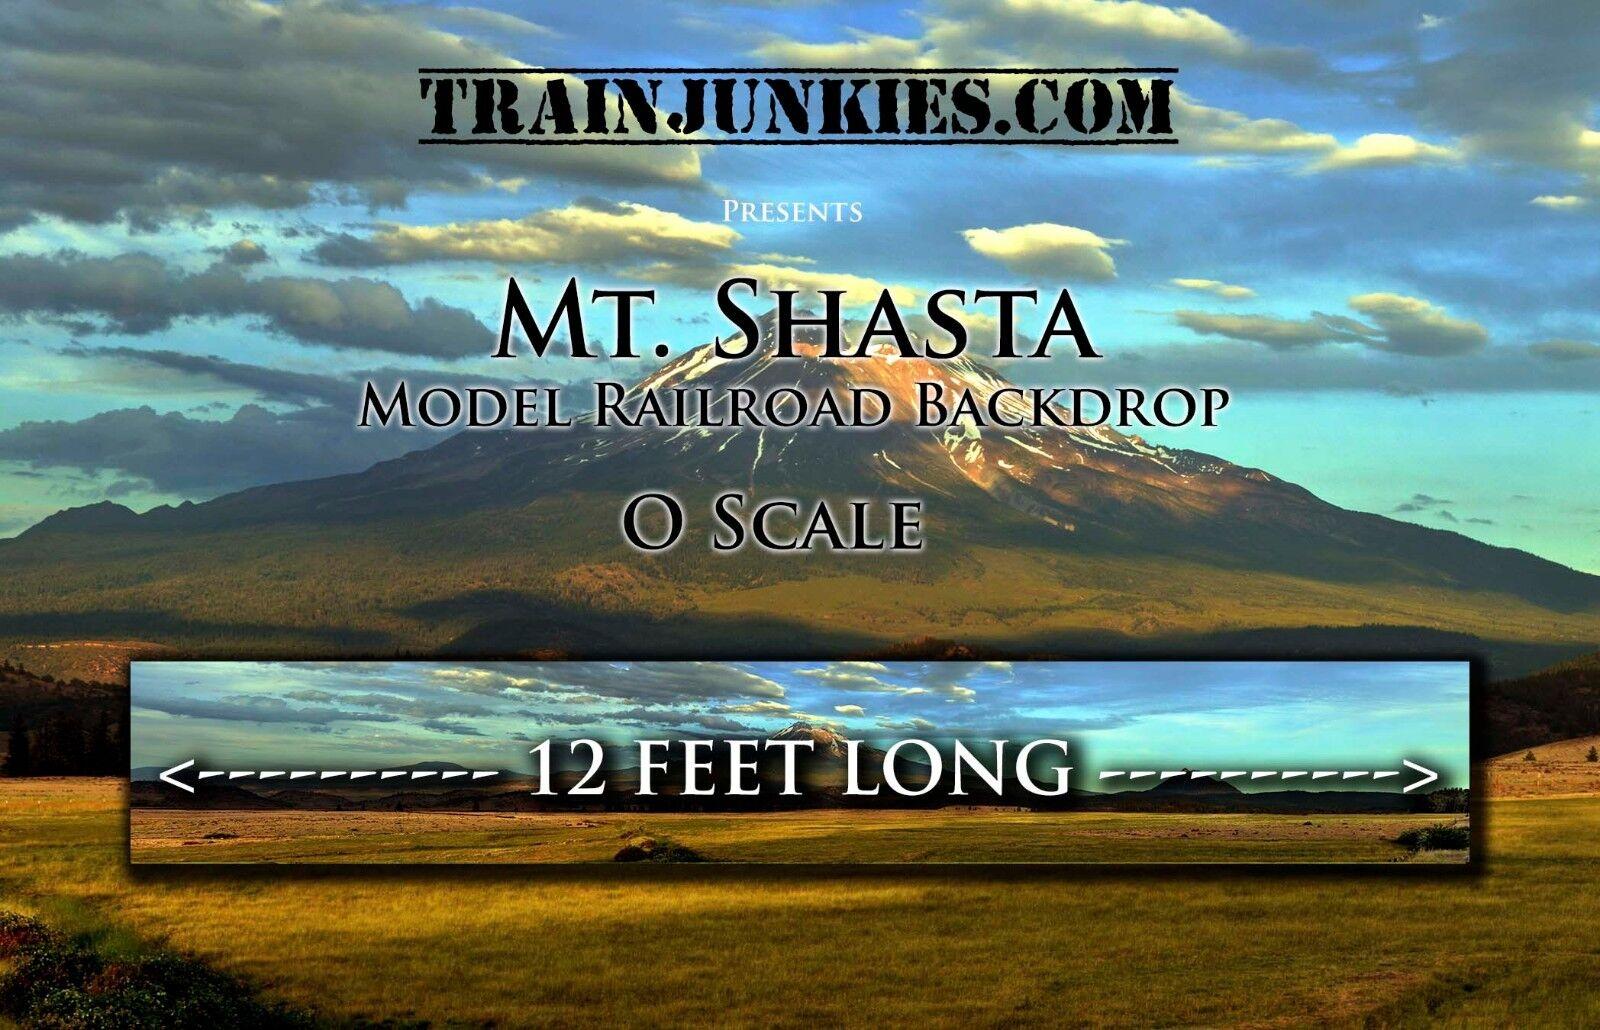 Trainjunkies o escala  Mount Shasta  modelo del ferroCocheril telón de fondo 24x144